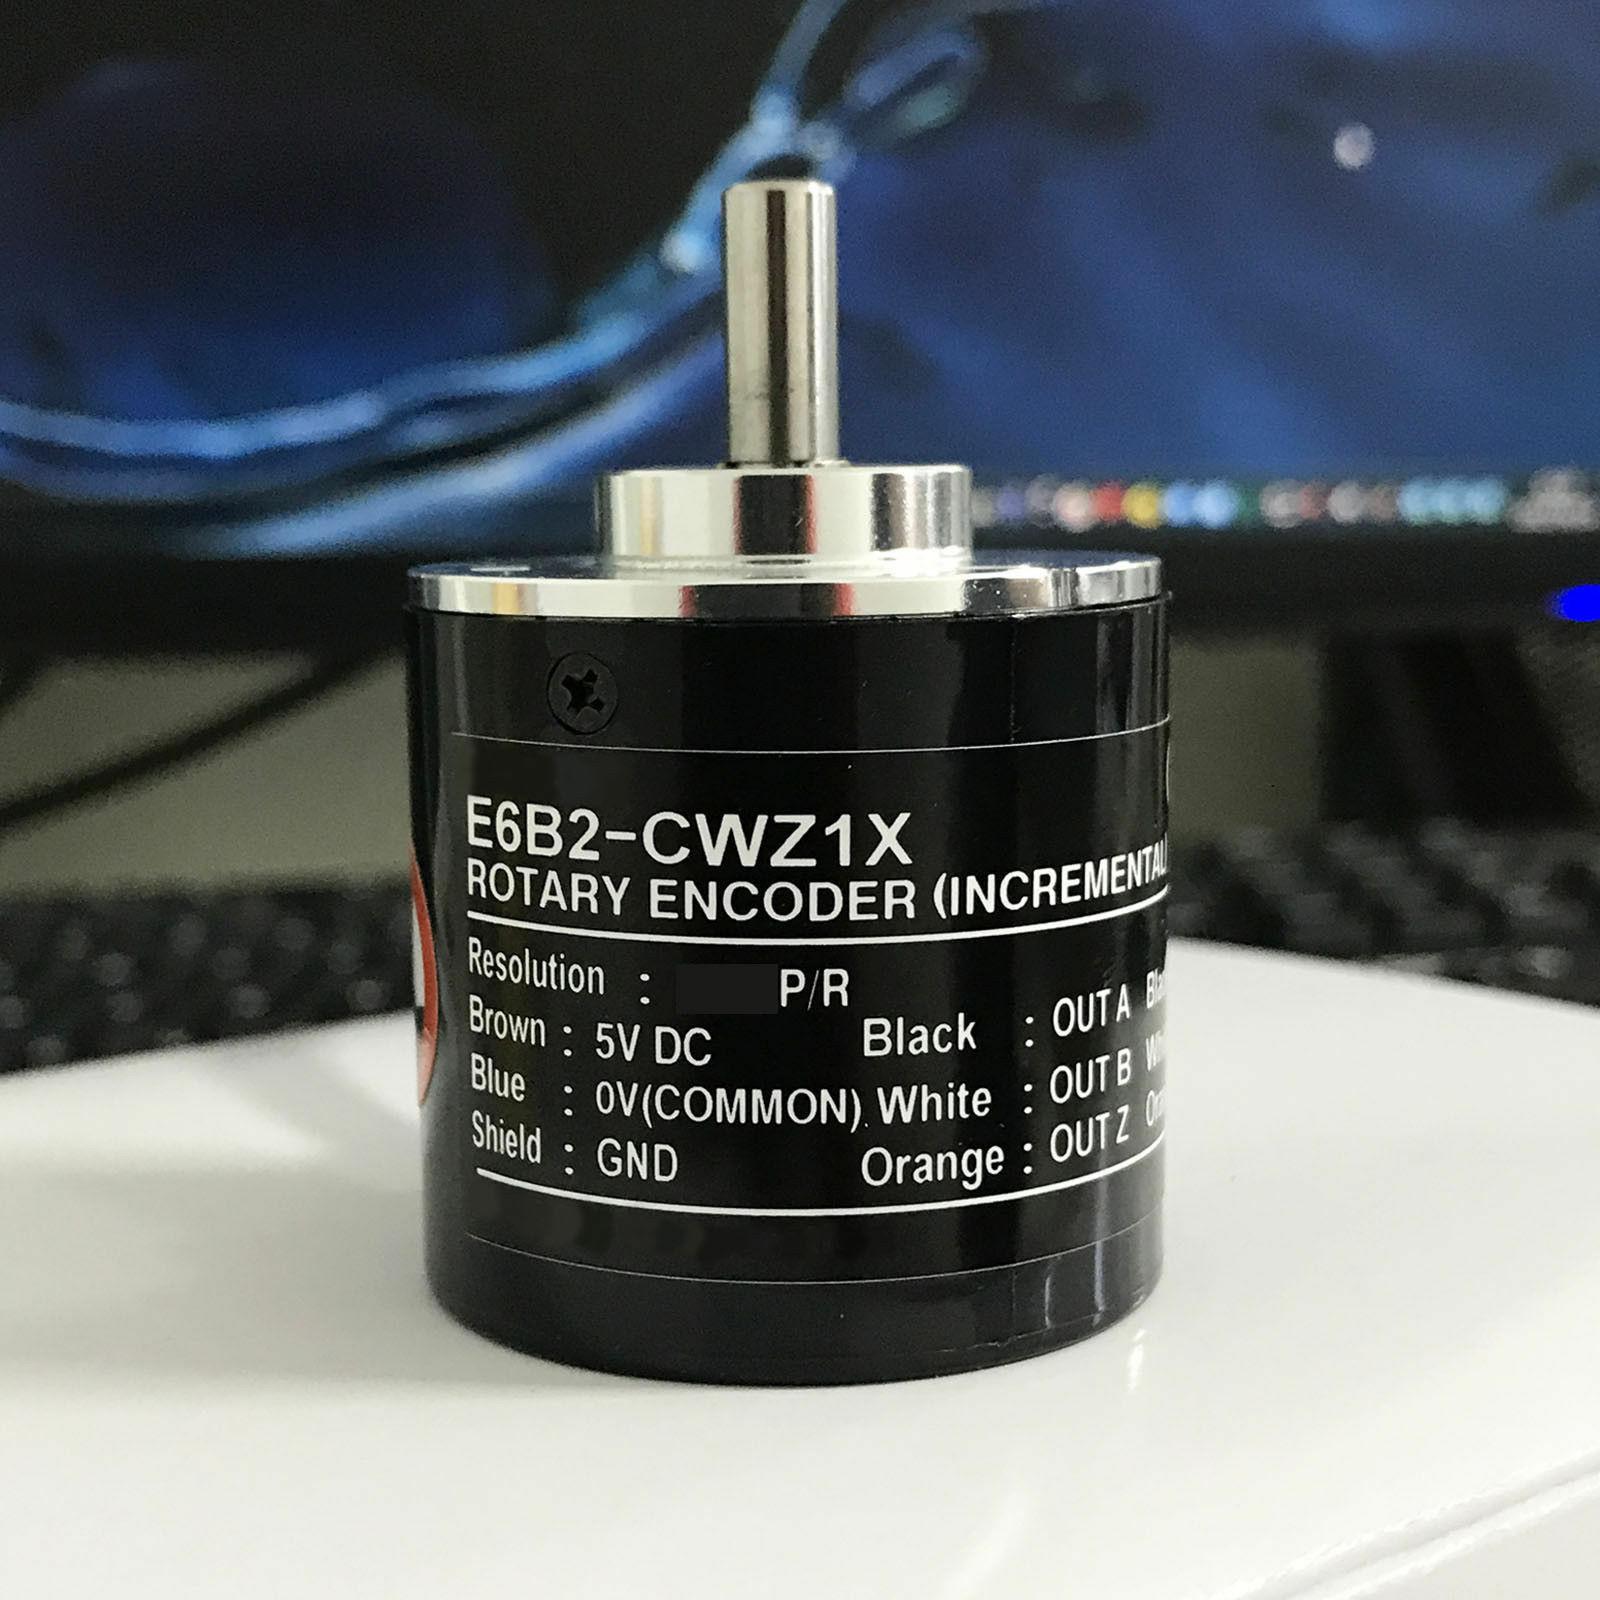 E6B2-CWZ1X التزايدي بصري الروتاري التشفير مفتاح دوار 30P/R إلى 2500P/R